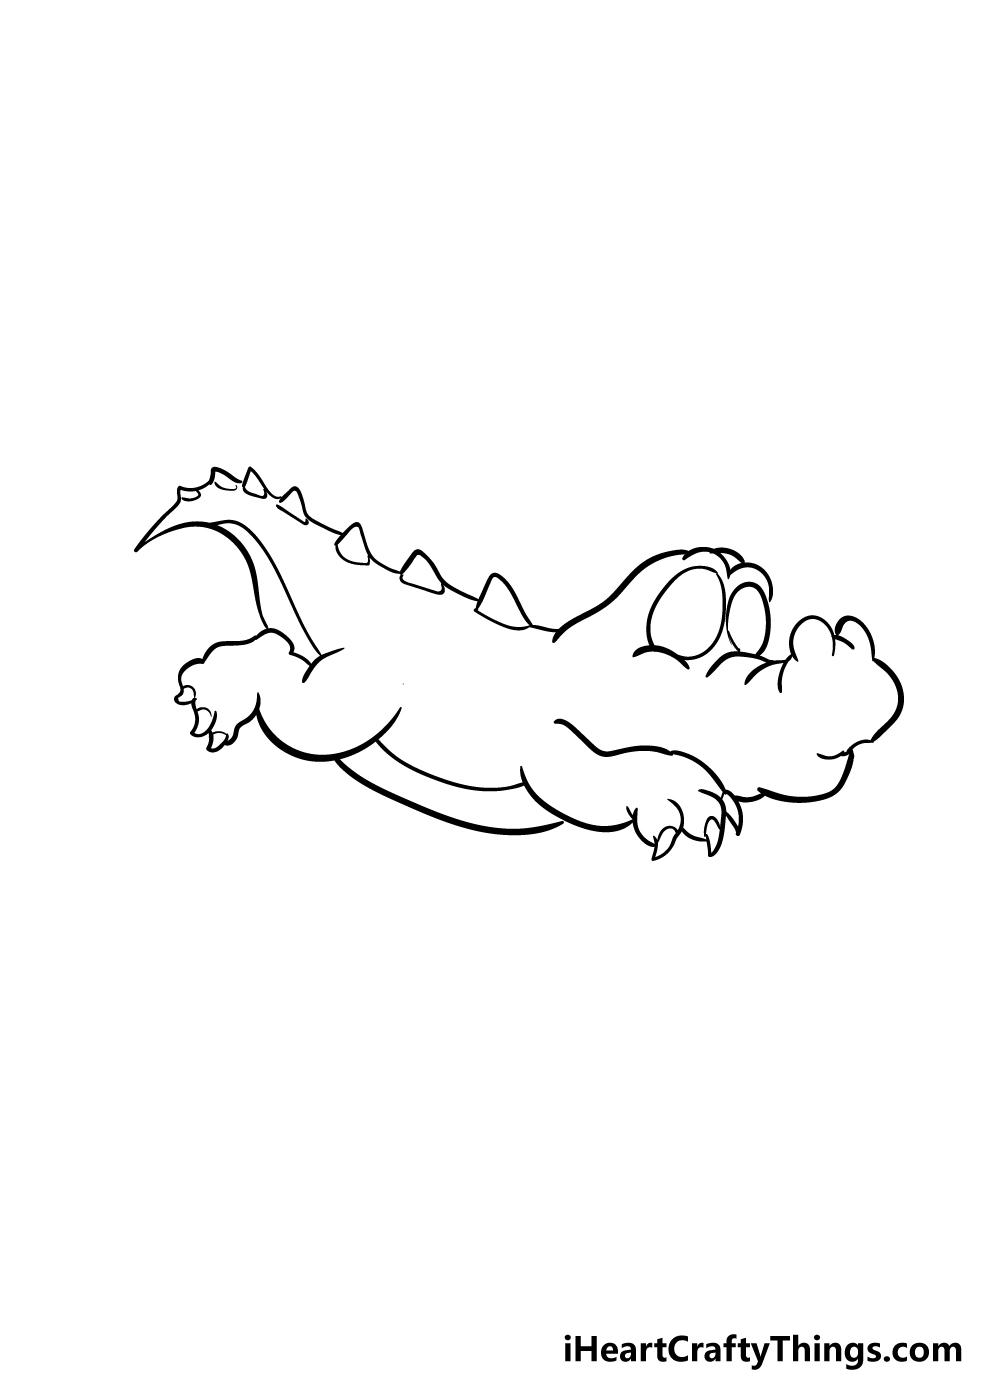 crocodile drawing step 4